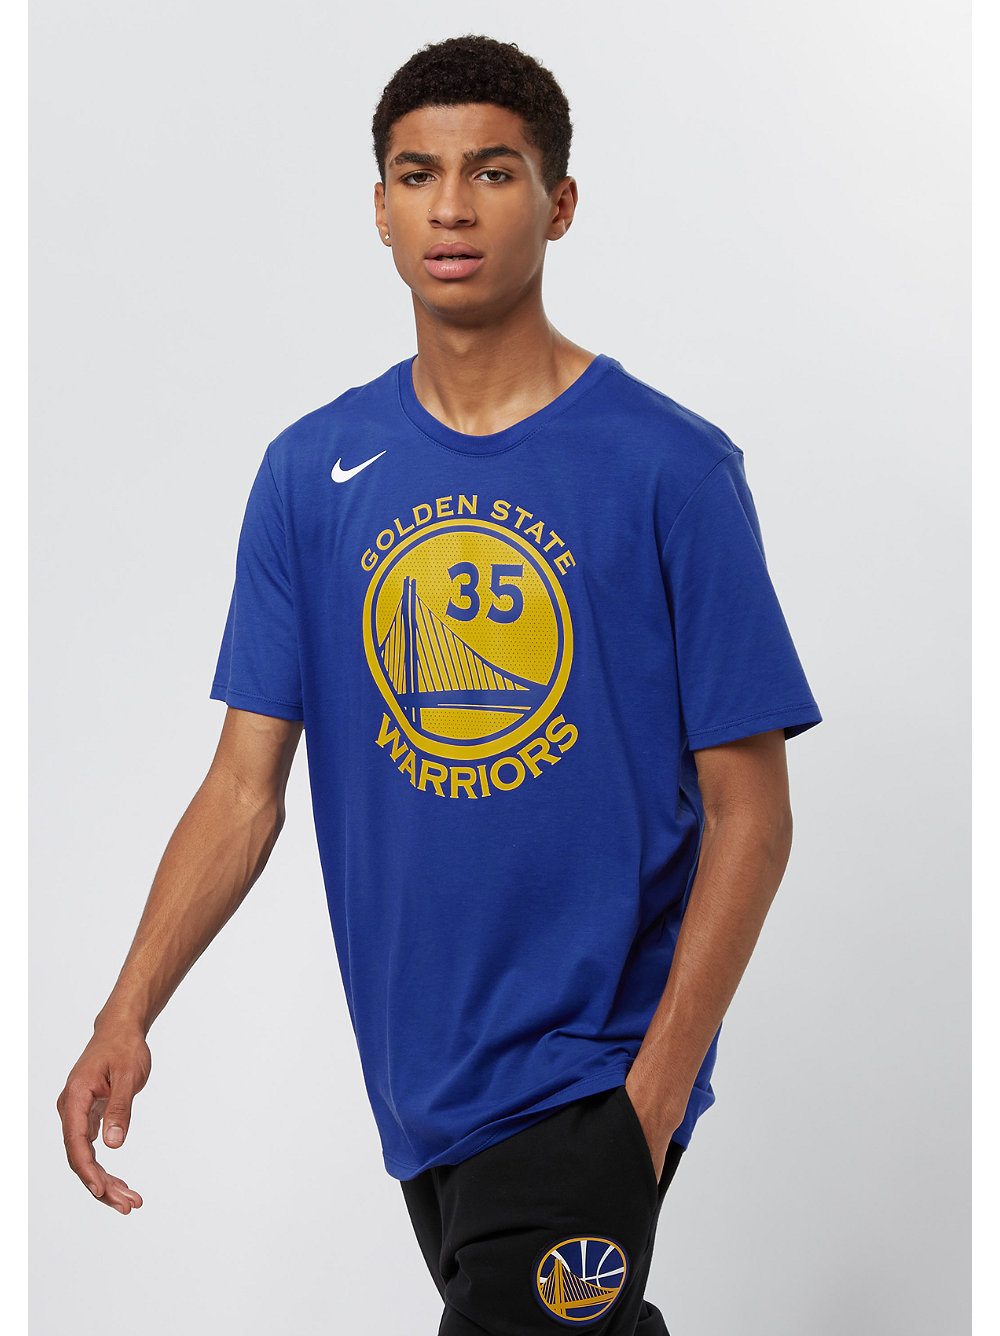 Nike t shirt nba golden state warriors durant snipes for Kevin durant golden state warriors t shirt